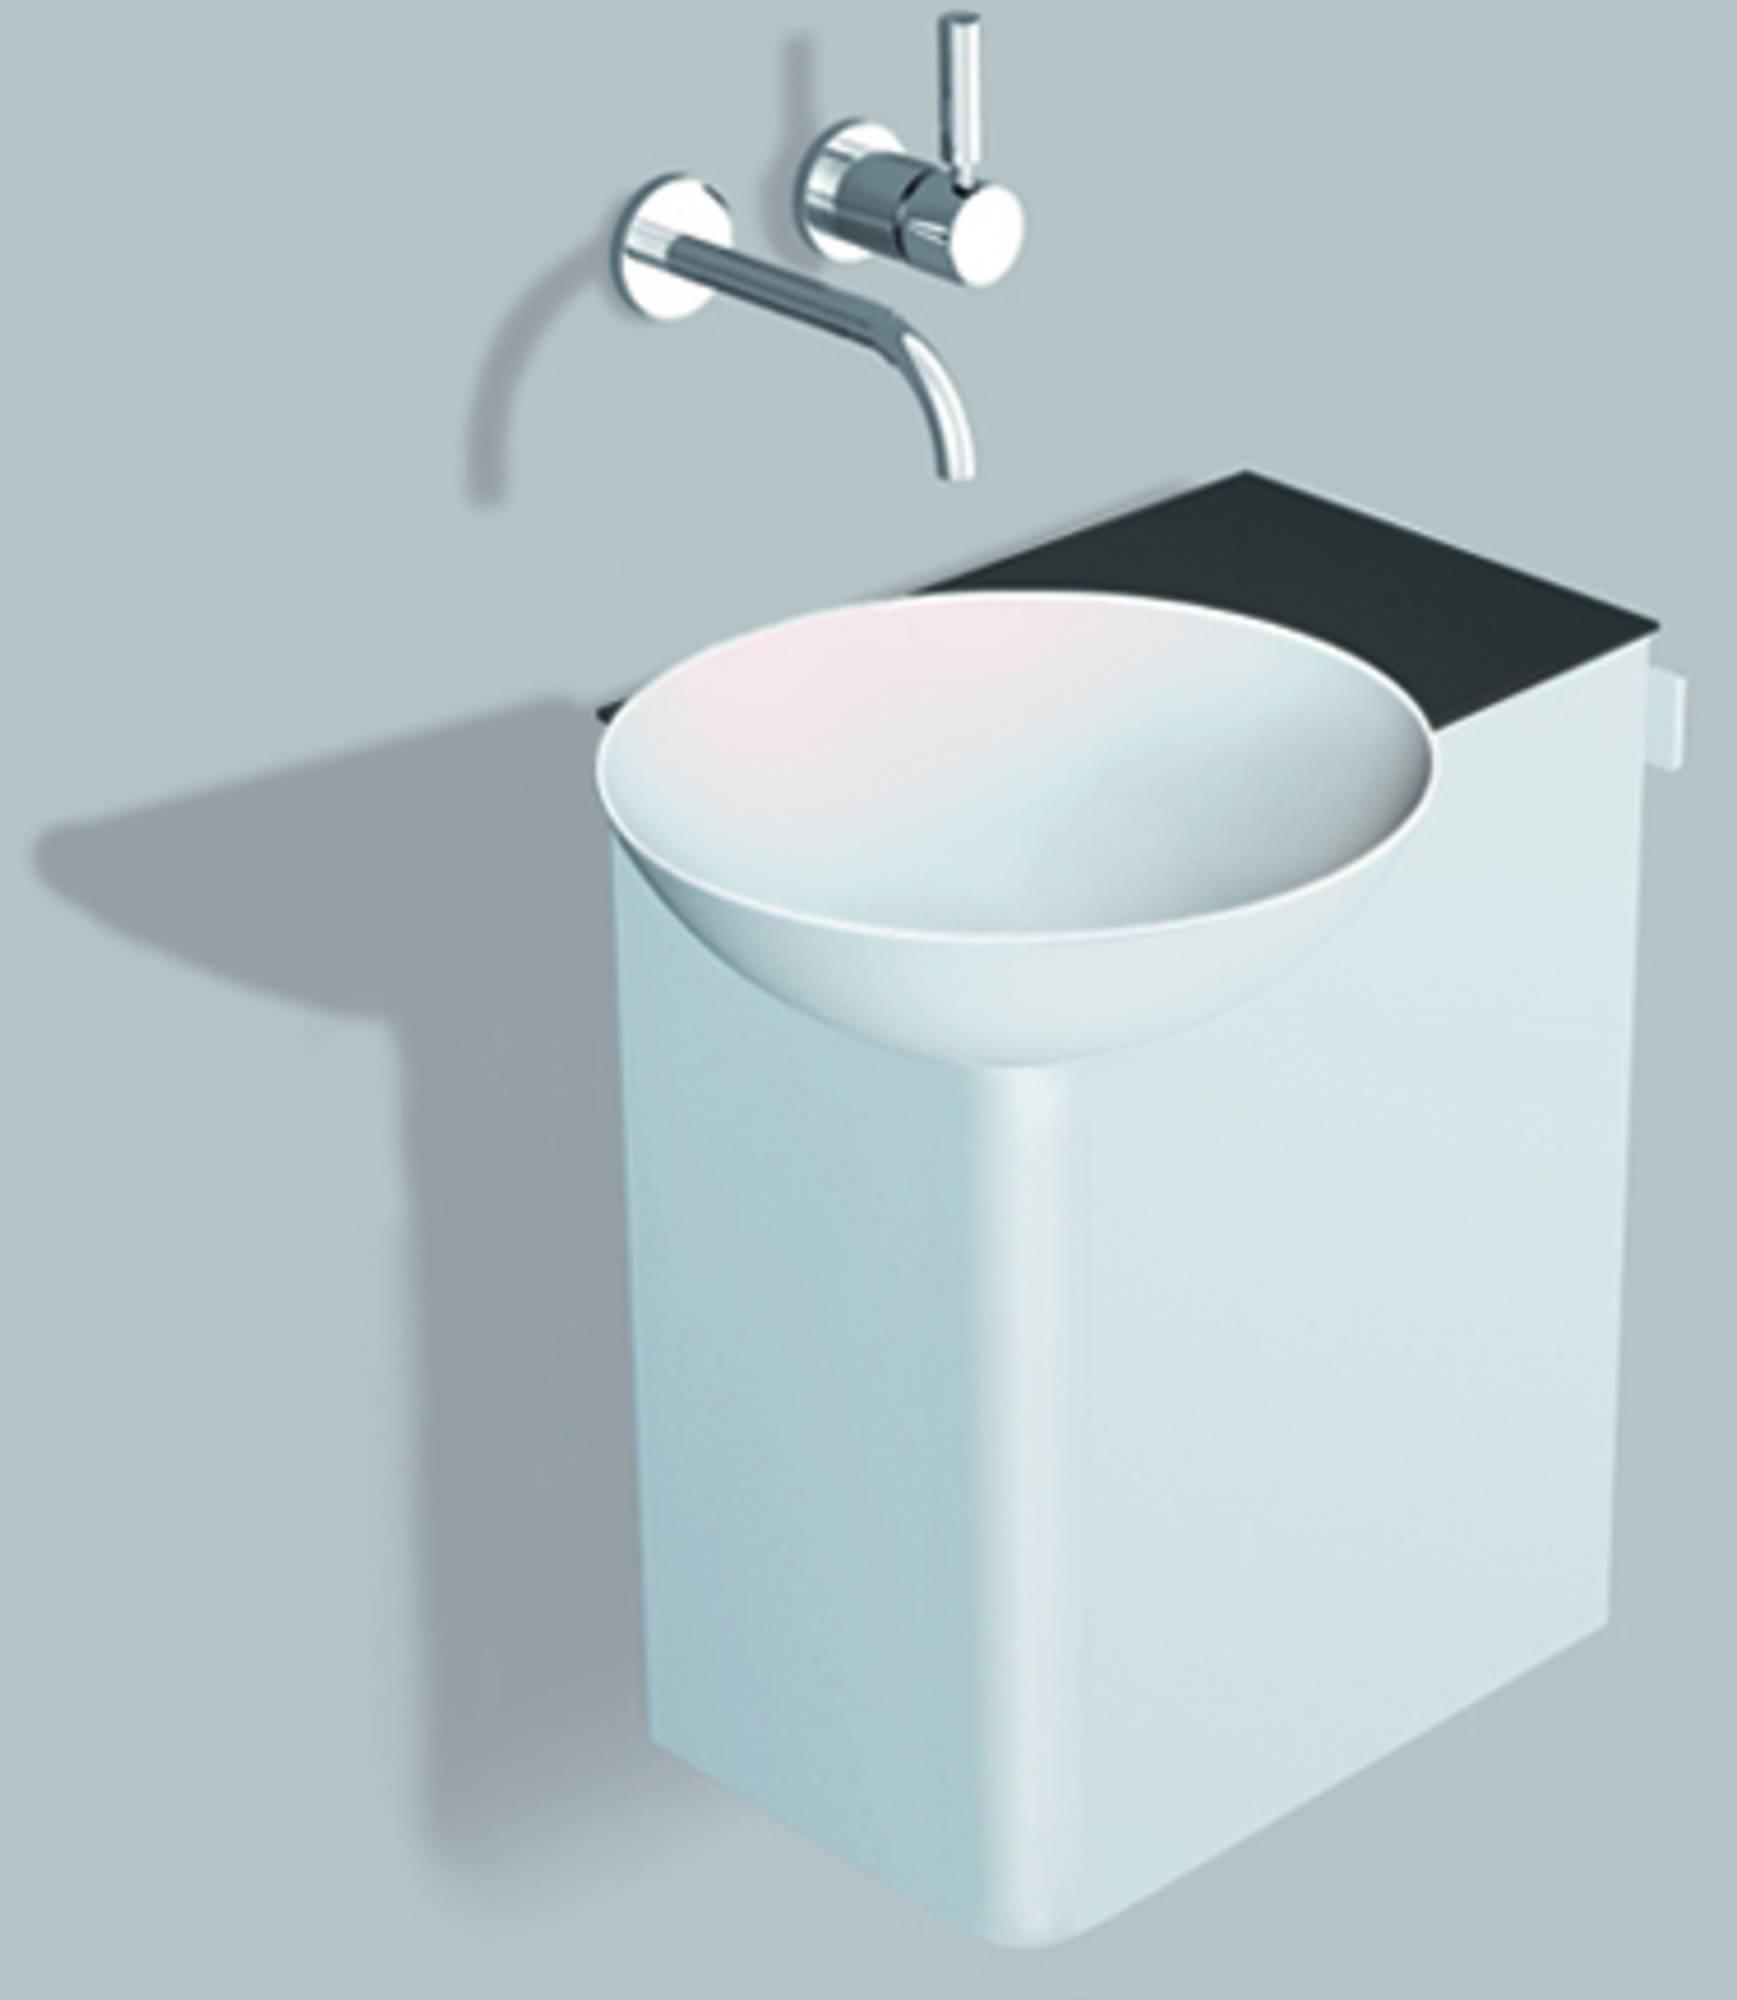 Alape Wp.insert 3 meubelset 48,5cm,wastafel links aflegvlak rechts, wit-antracietbruin